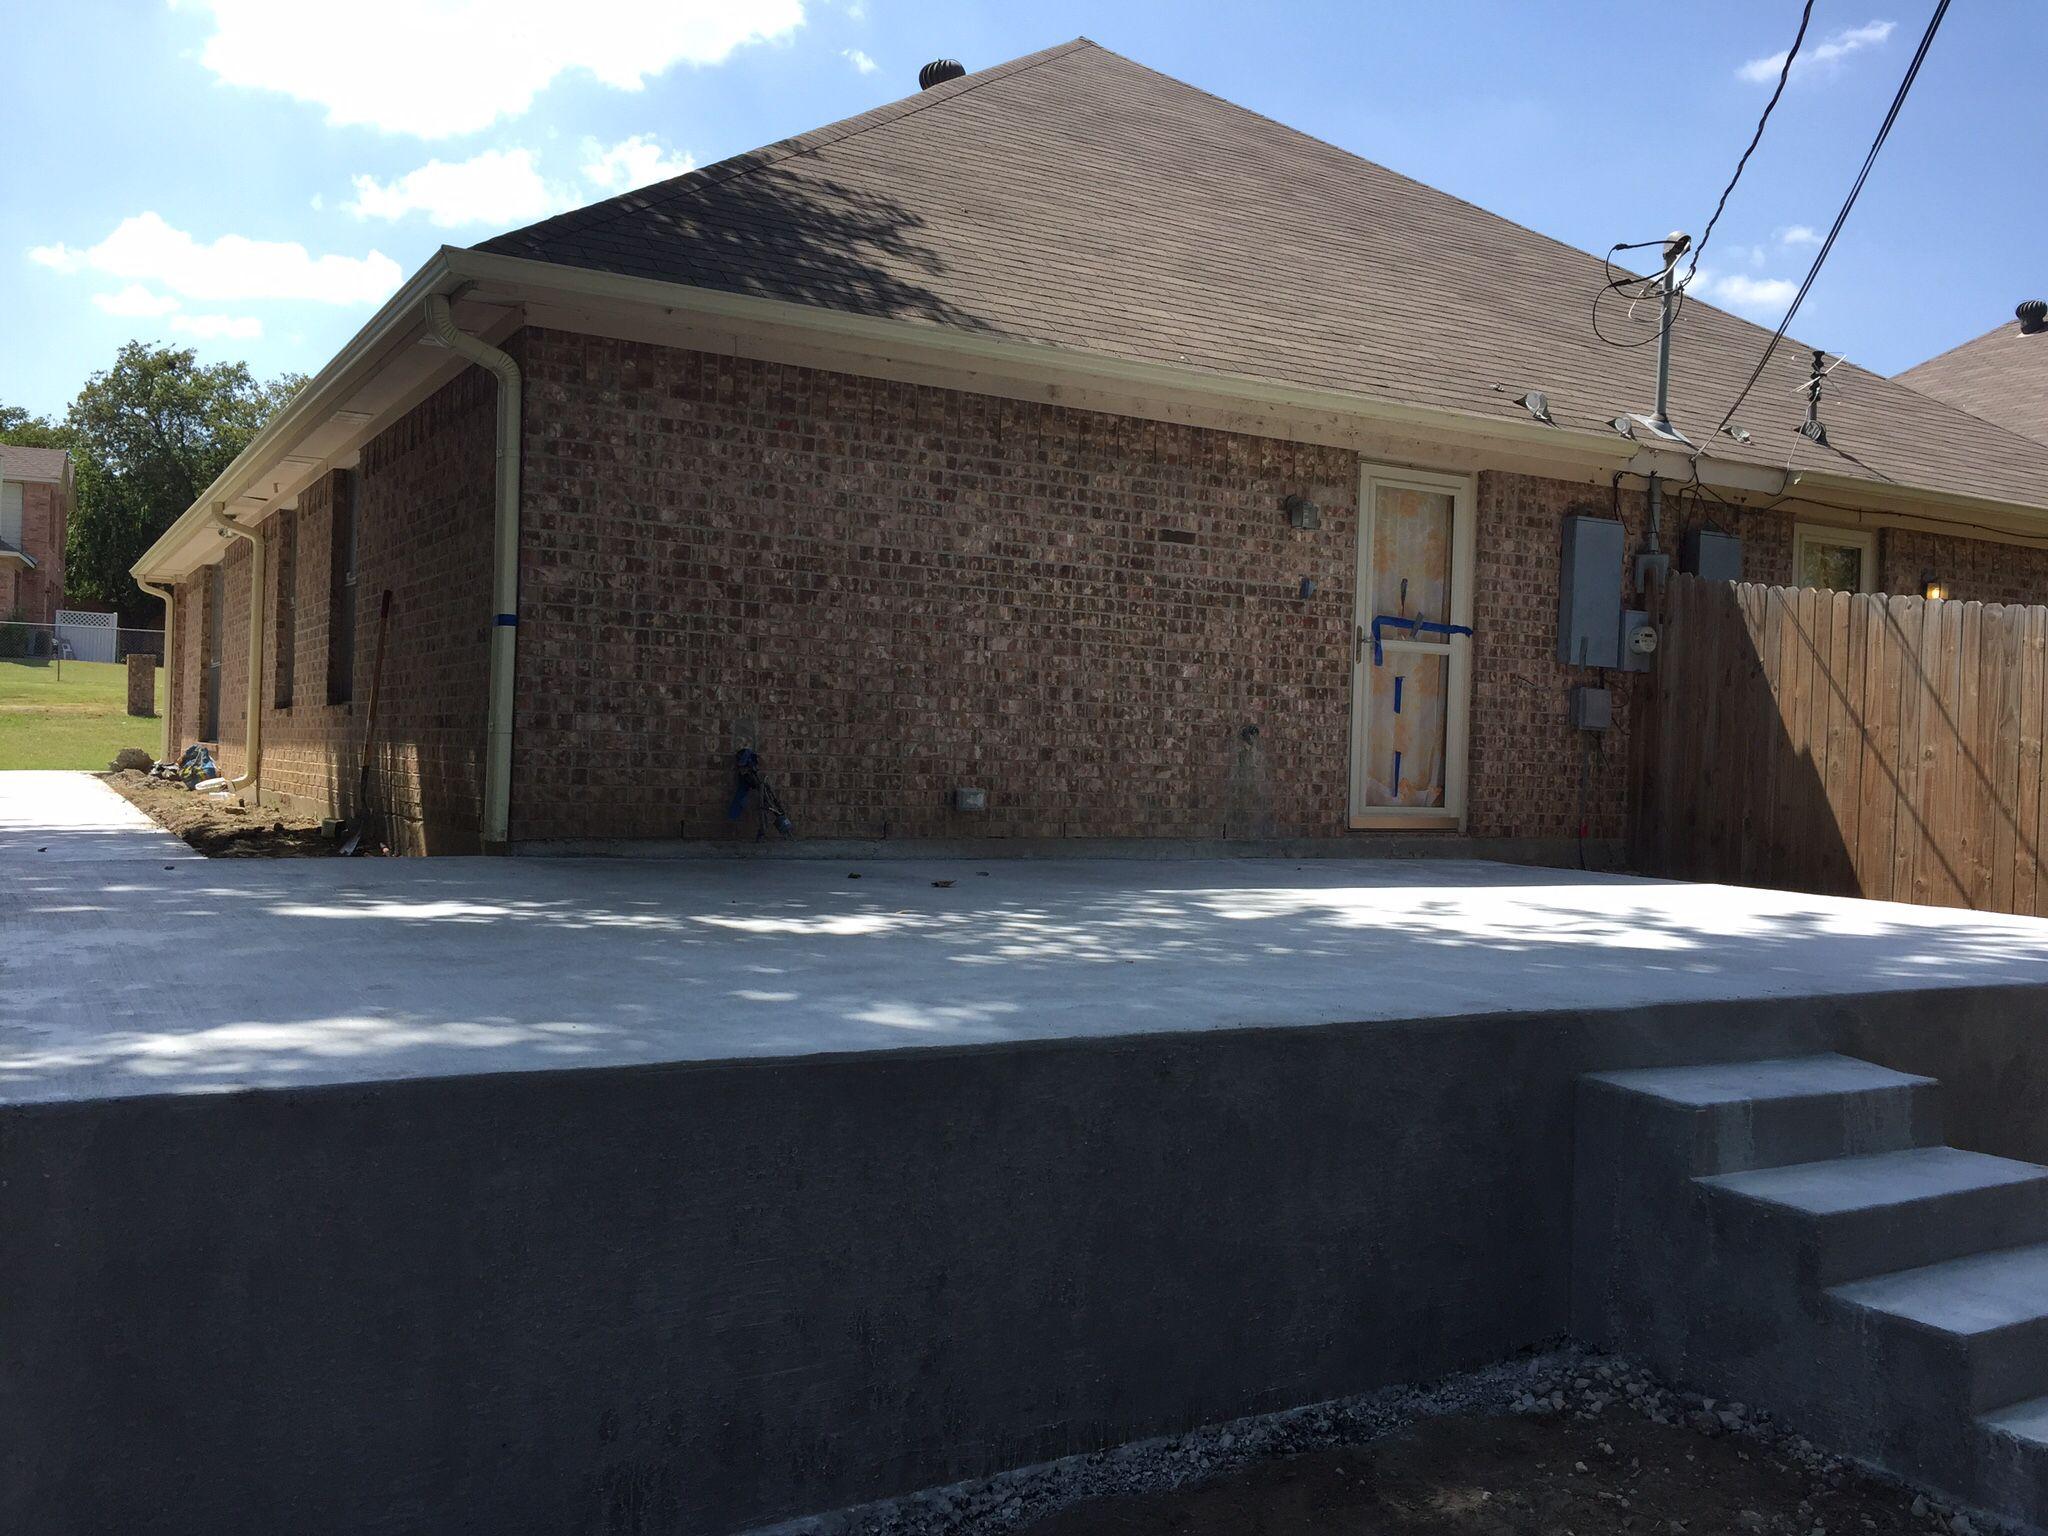 Concrete Slab And Wall Concrete Slab Outdoor Decor Concrete